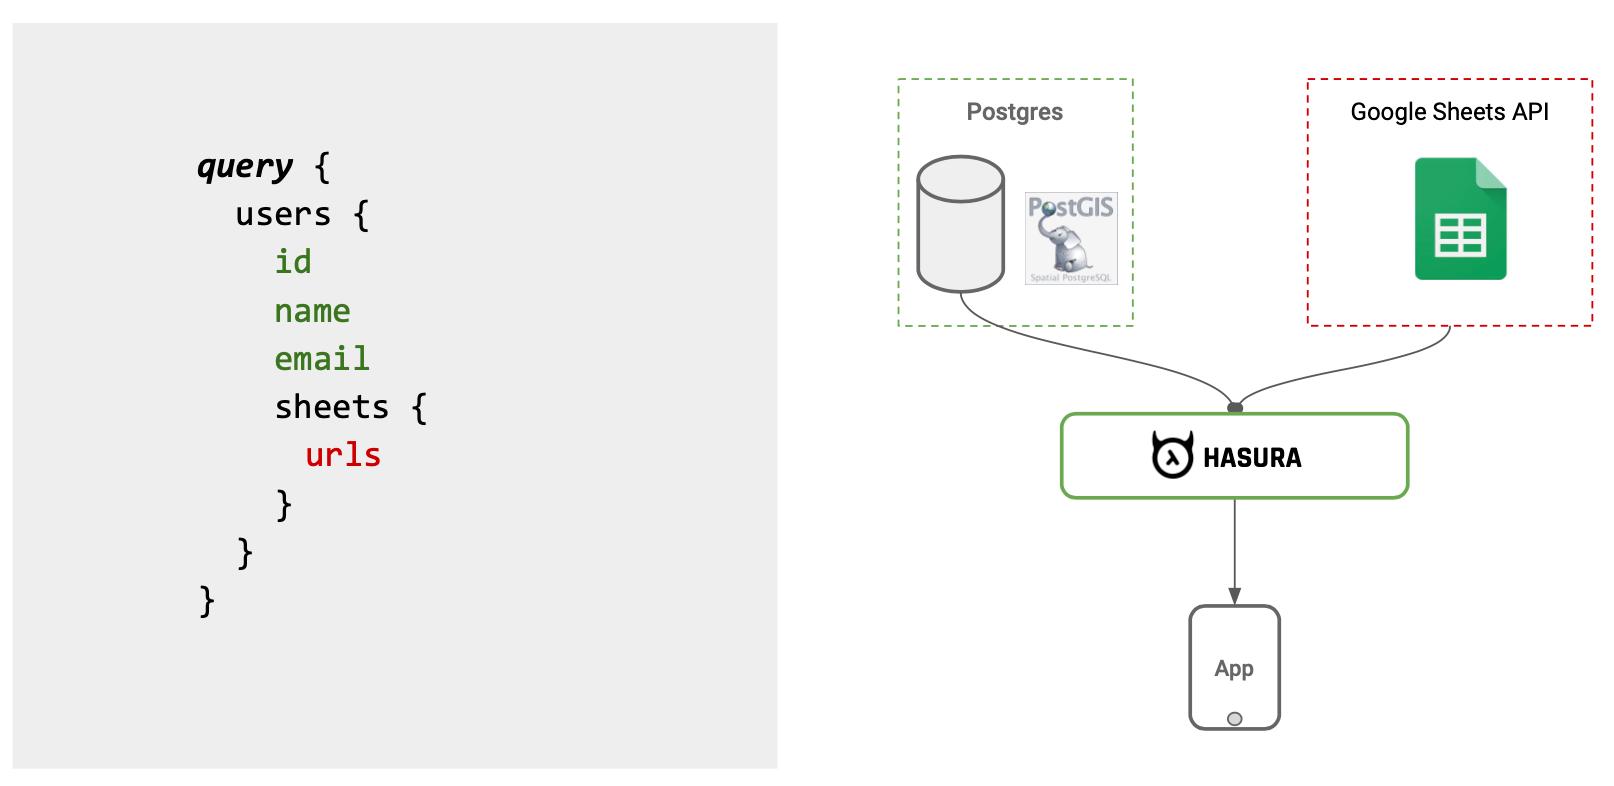 Join data from Google Sheets API and Postgres using Hasura